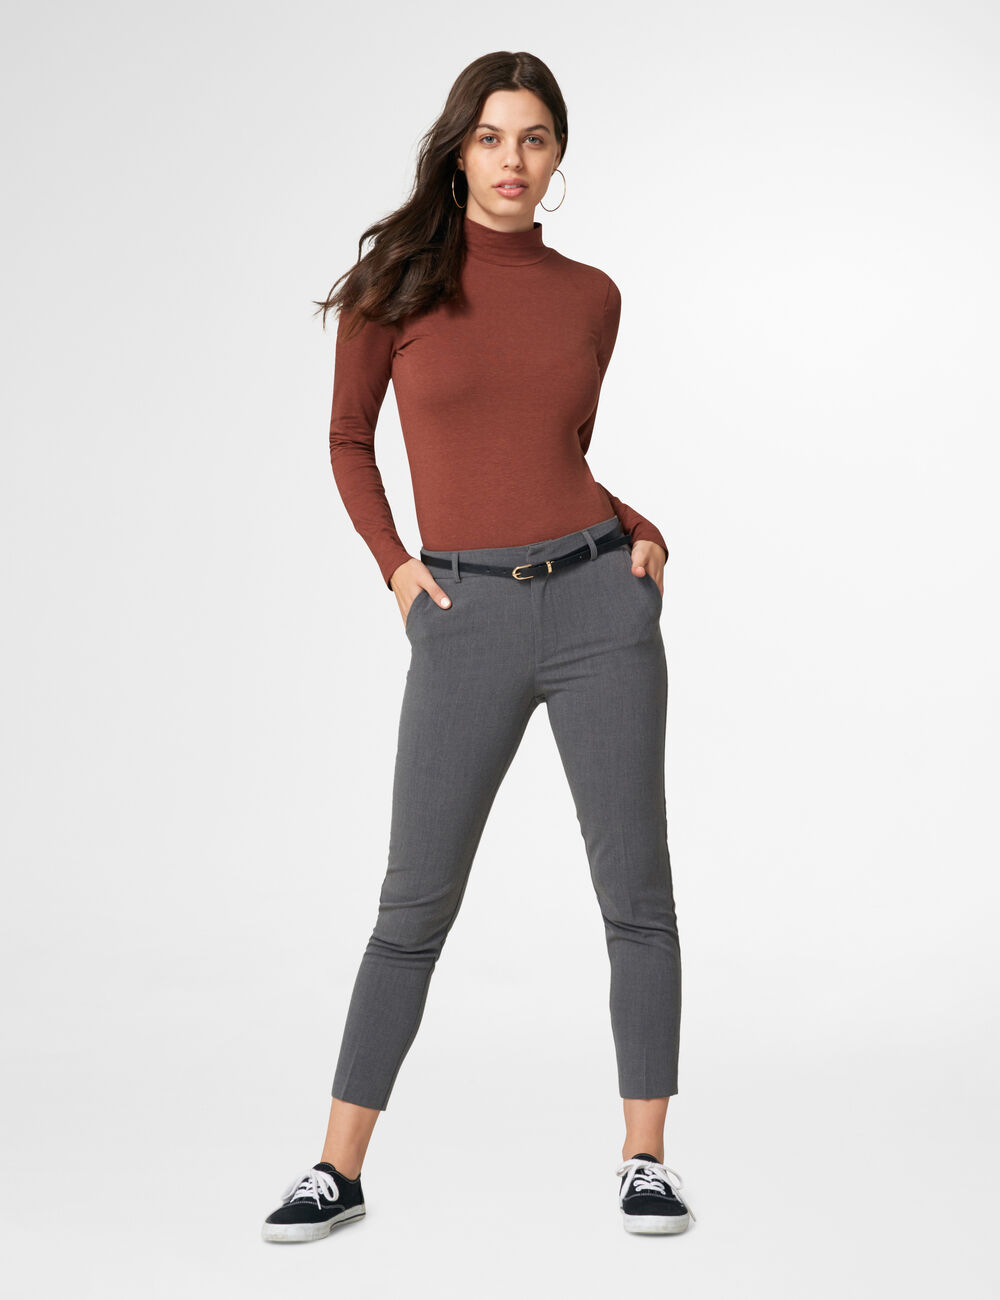 pantalon ville avec ceinture gris femme jennyfer. Black Bedroom Furniture Sets. Home Design Ideas